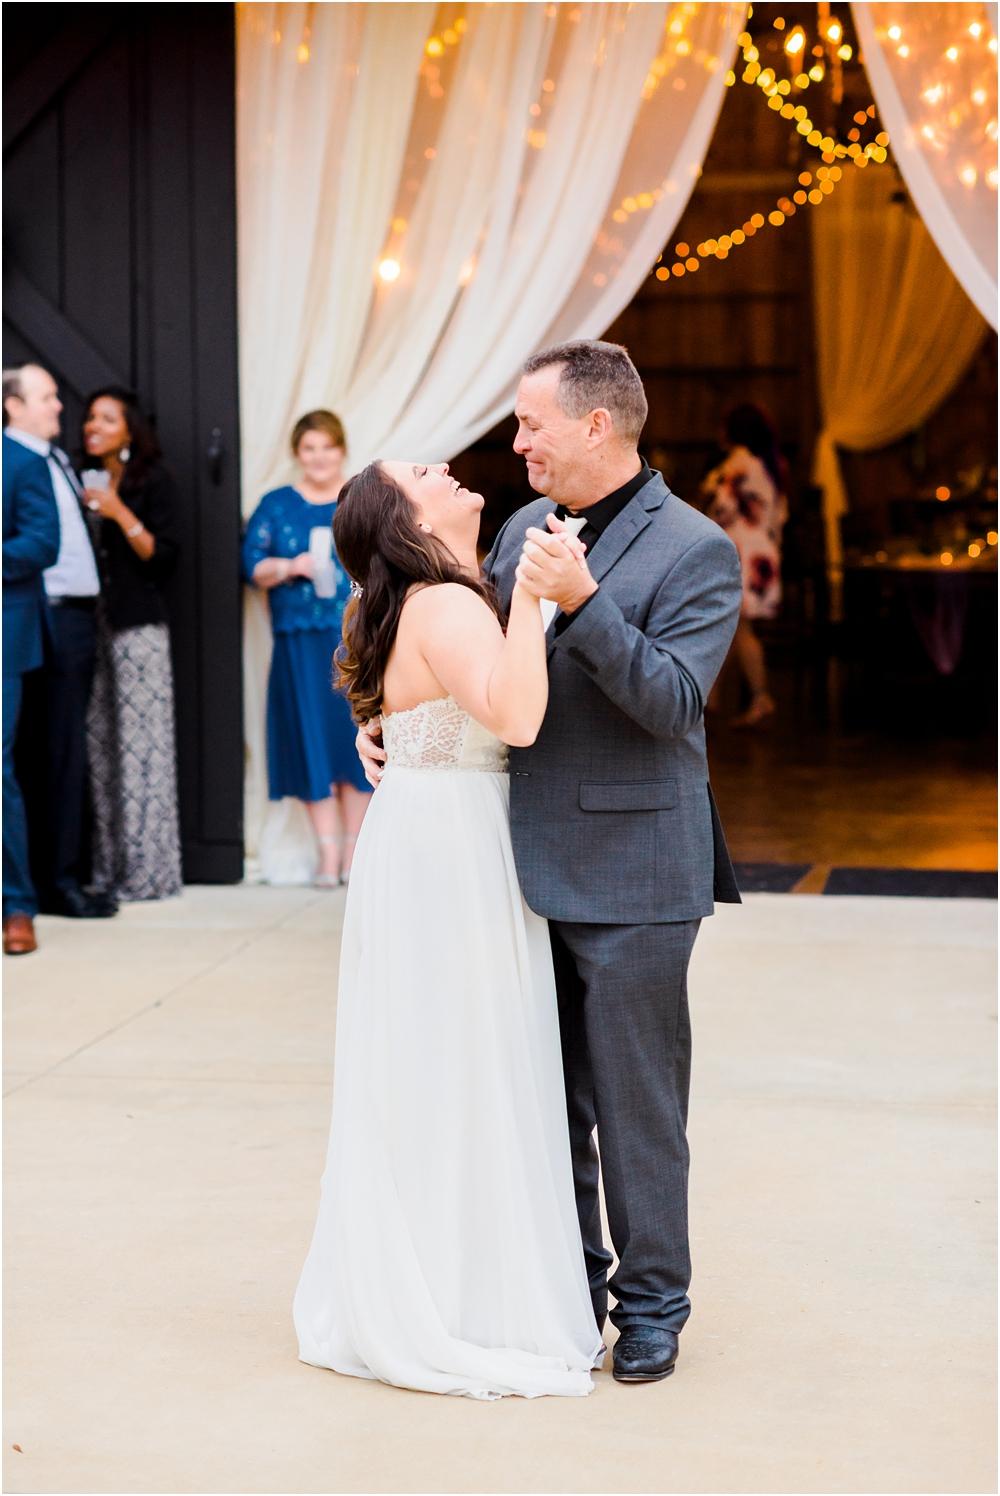 southern-lea-farms-wedding-kiersten-stevenson-photography-vernon-florida-wedding126.jpg